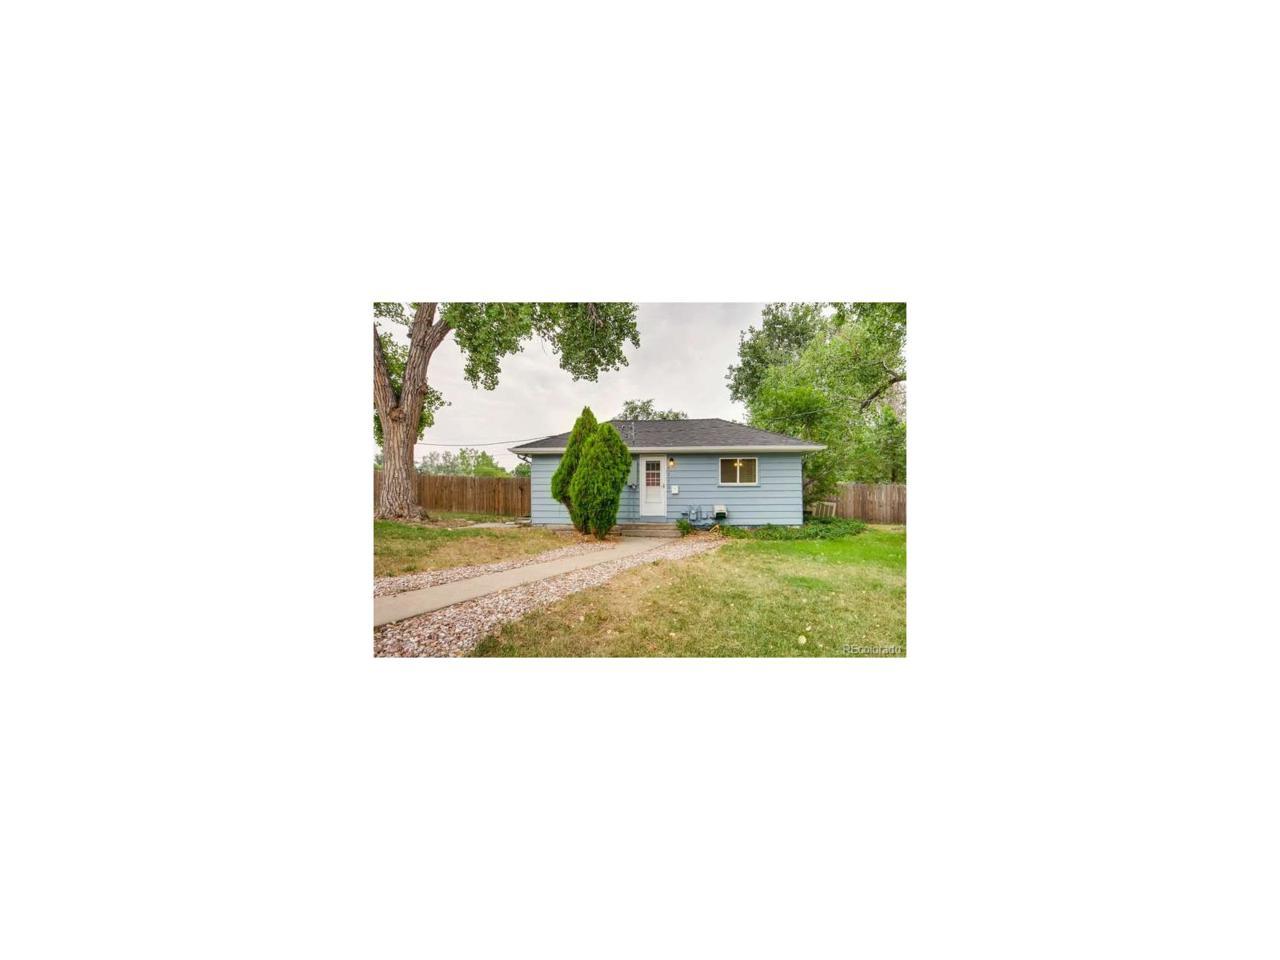 6230 Otis Street, Arvada, CO 80003 (MLS #6284520) :: 8z Real Estate